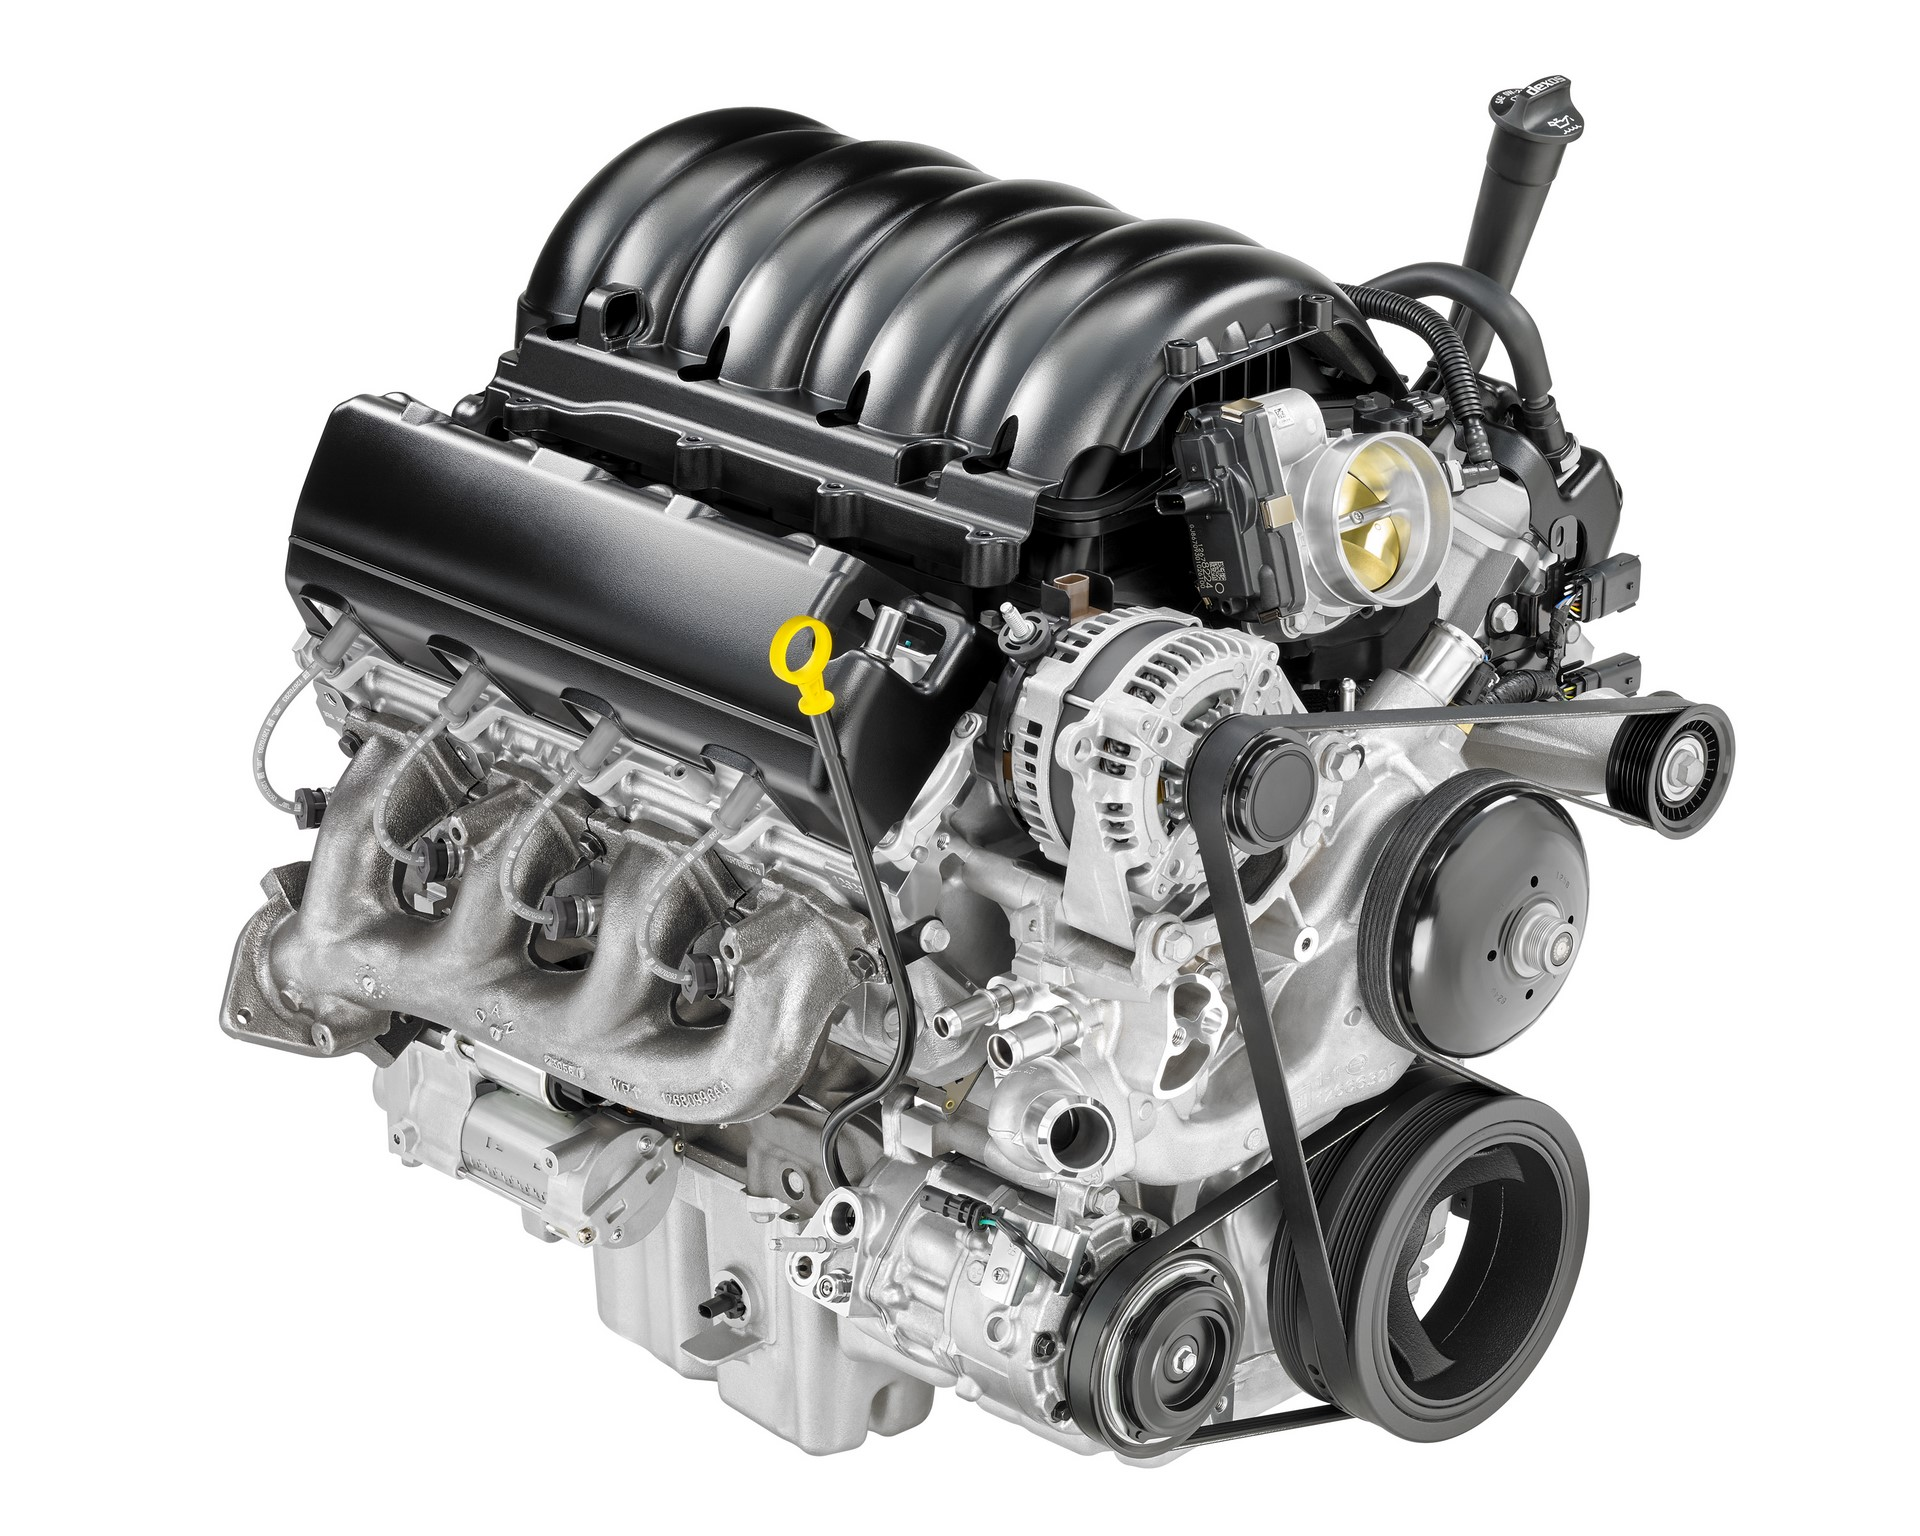 2019 5.3L V-8 DFM VVT DI (L84) for Chevrolet Silverado